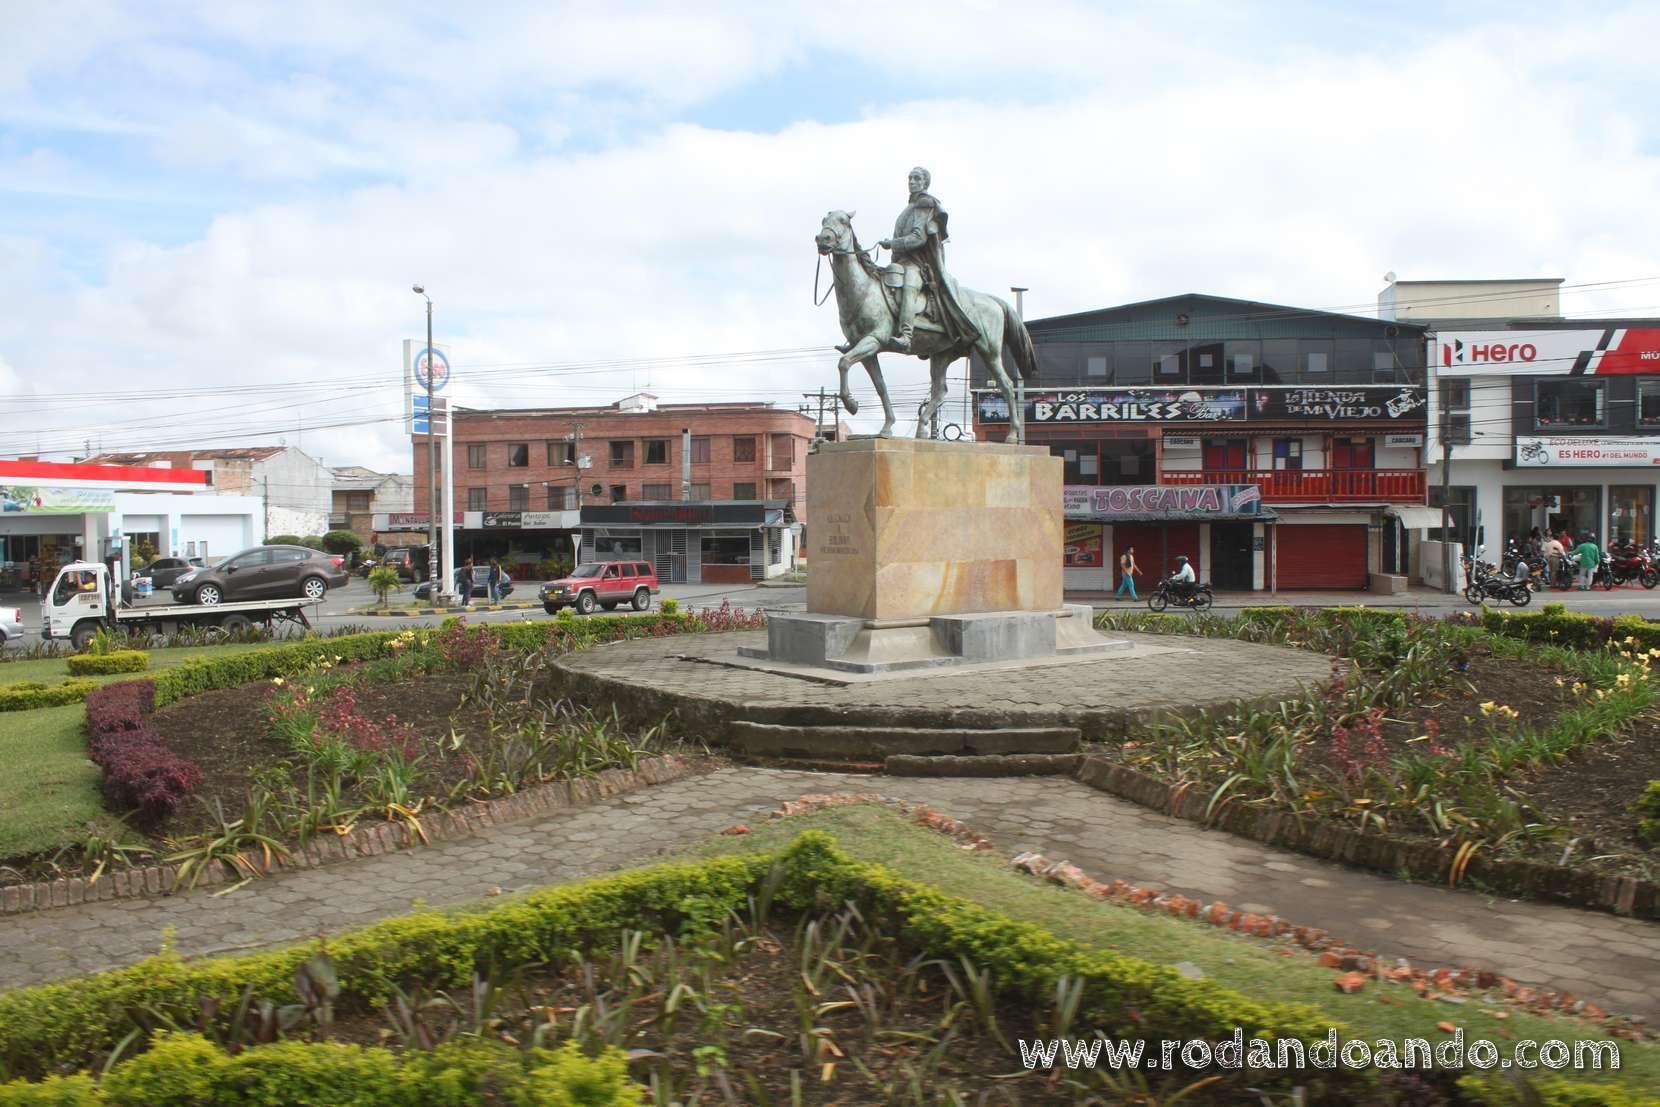 Comenzamos a ver estatuas de Simón Bolivar